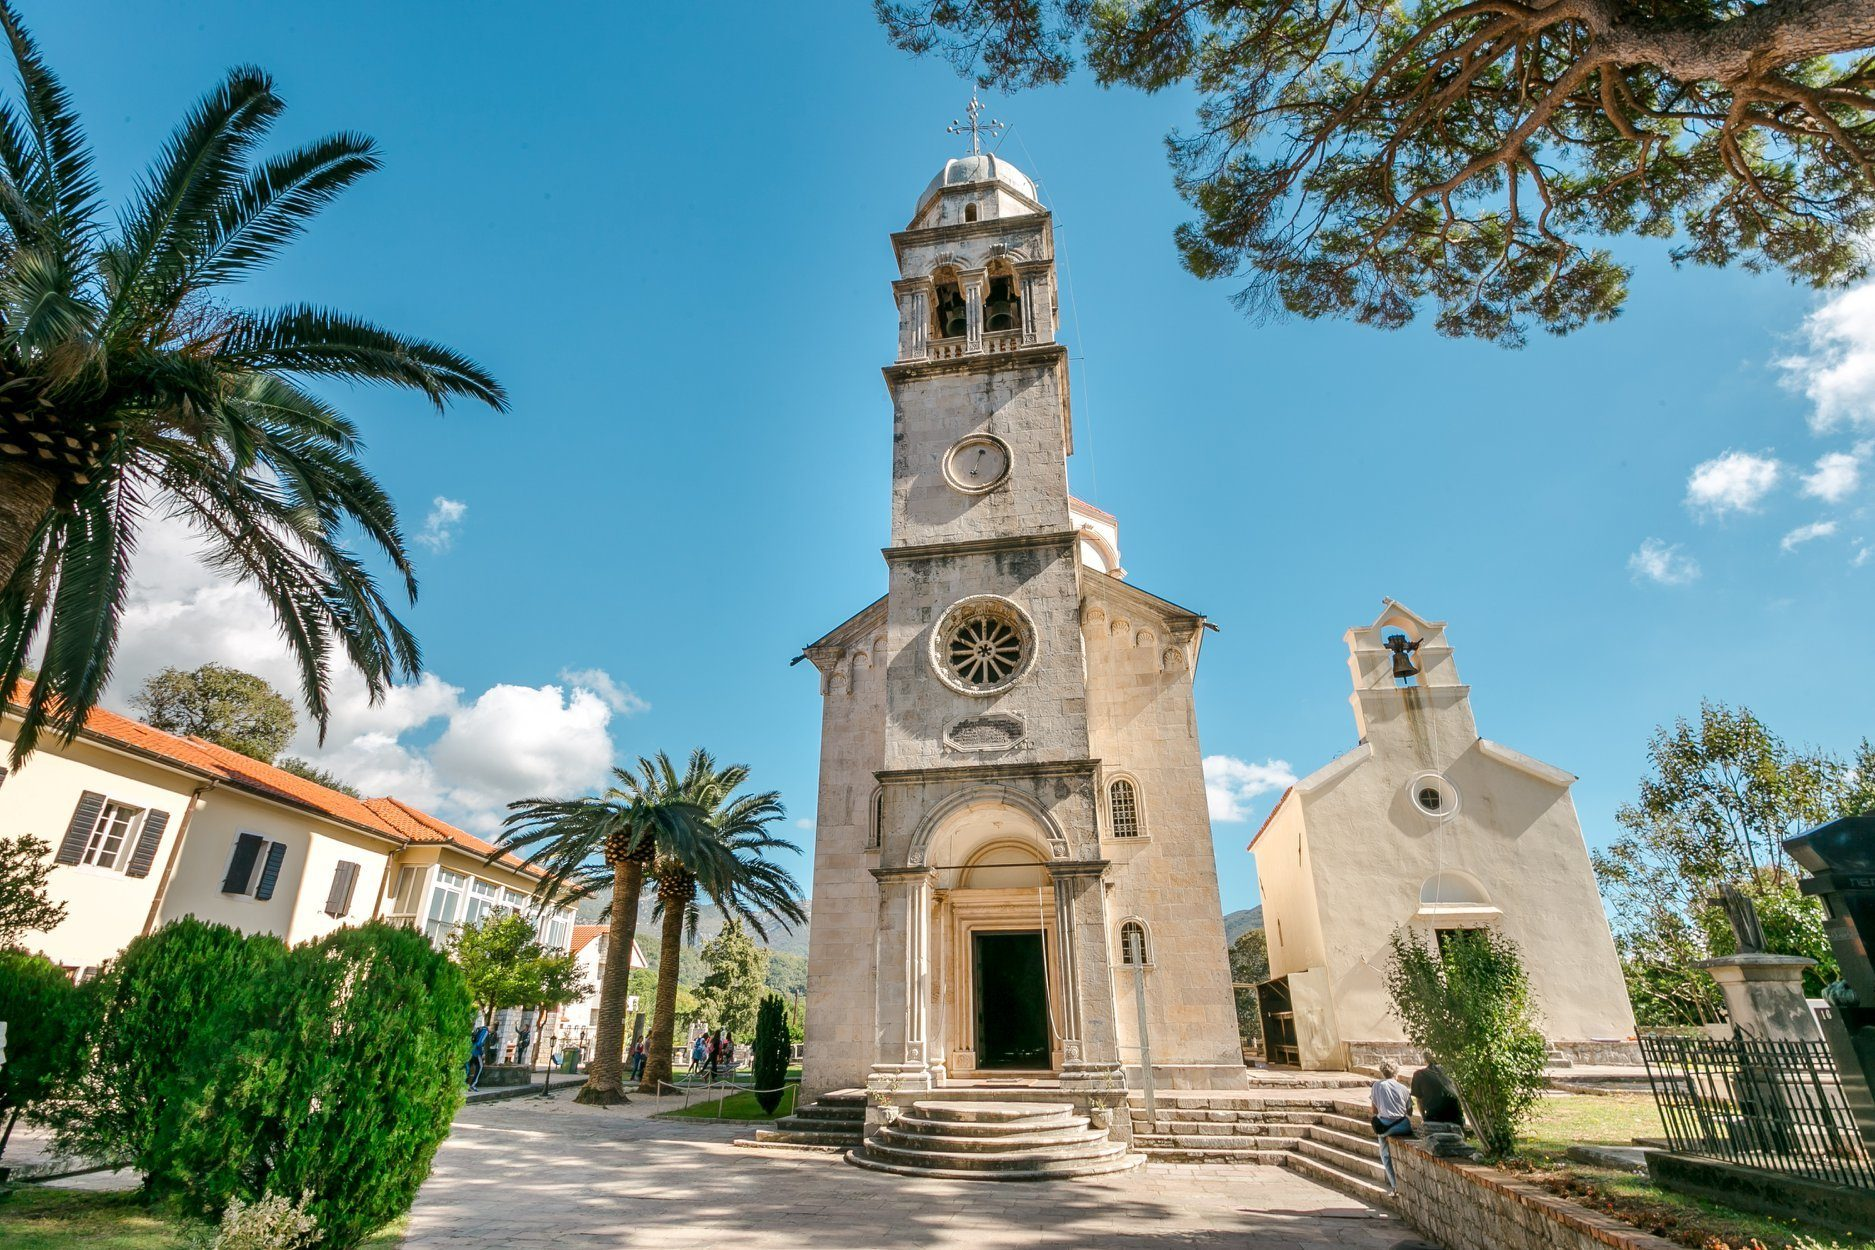 Things To Do in Herceg Novi, Montenegro